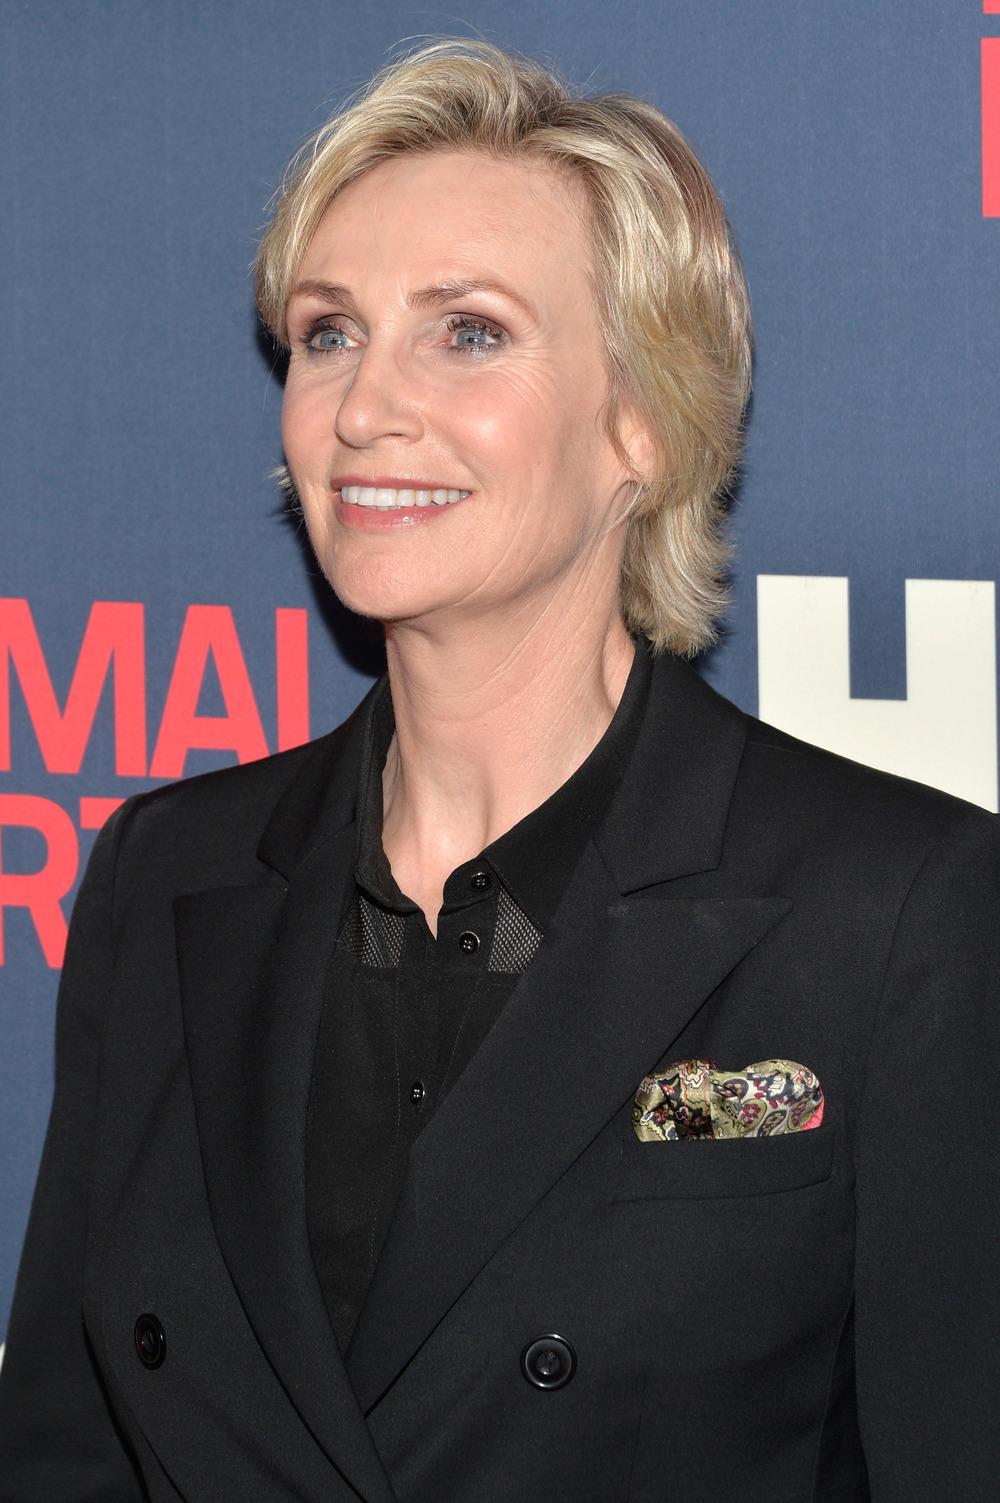 Is Jane Lynch Heading Back to Criminal Minds?